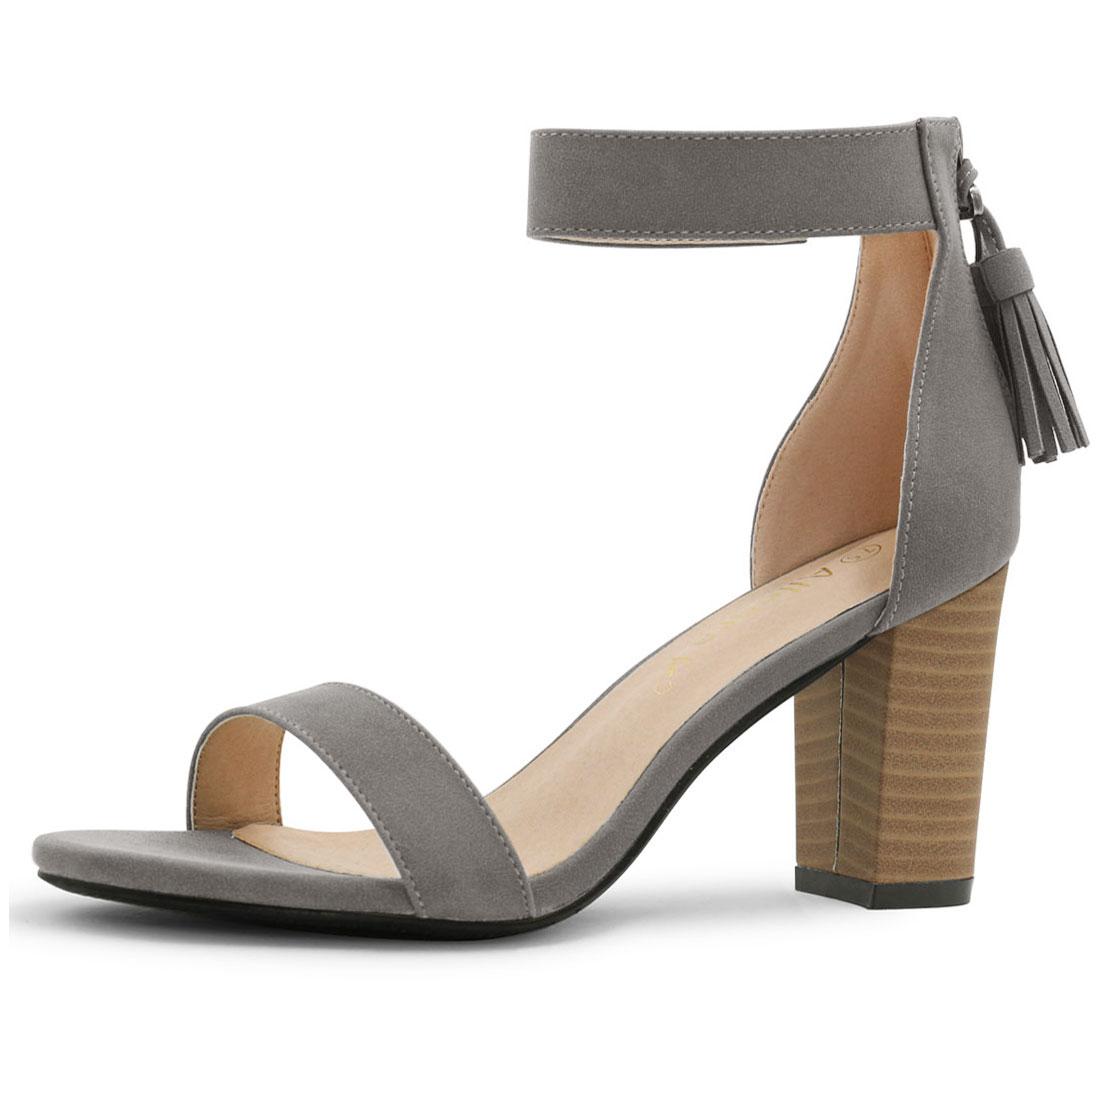 57d38d56b44 Unique Bargains Women s Open Toe Tassel Stacked Heel Ankle Strap Sandals  Dark Gray (Size 9